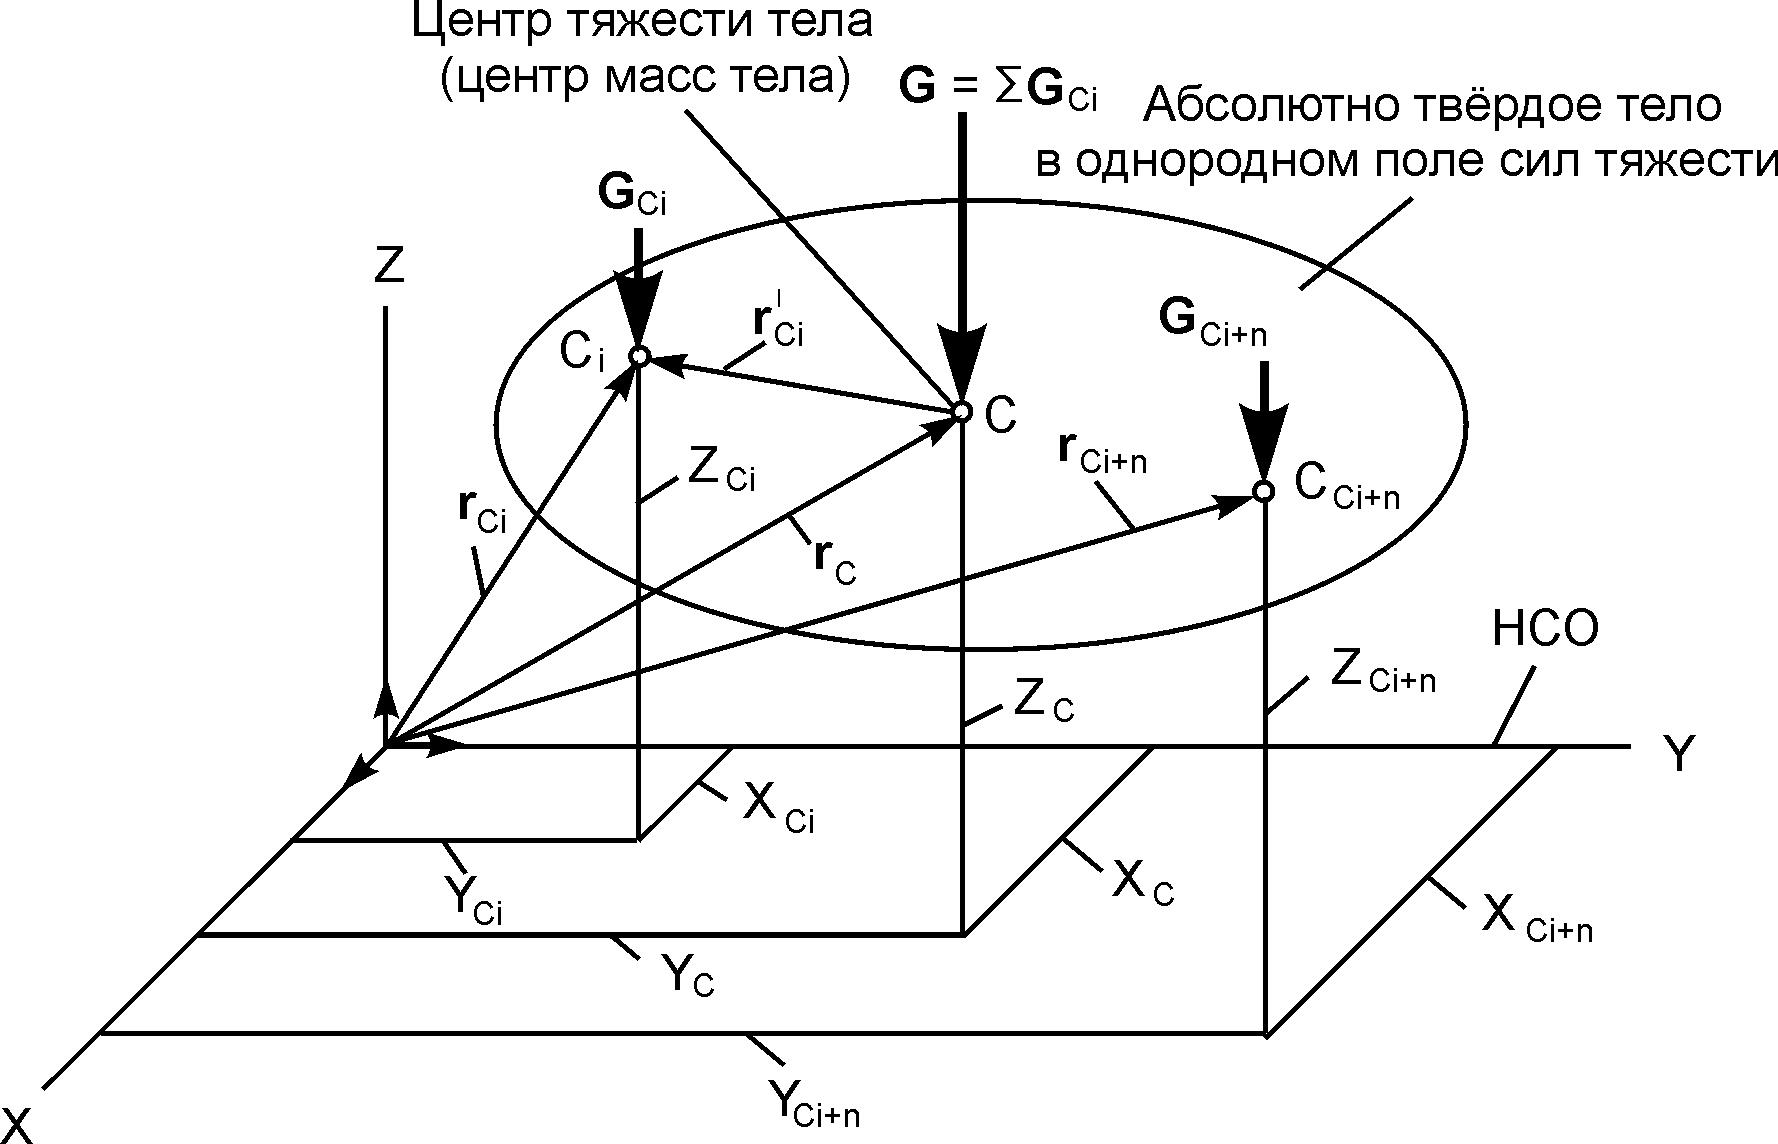 Определение положения центра тяжести тела решение задач карточки решения задач 3 класс